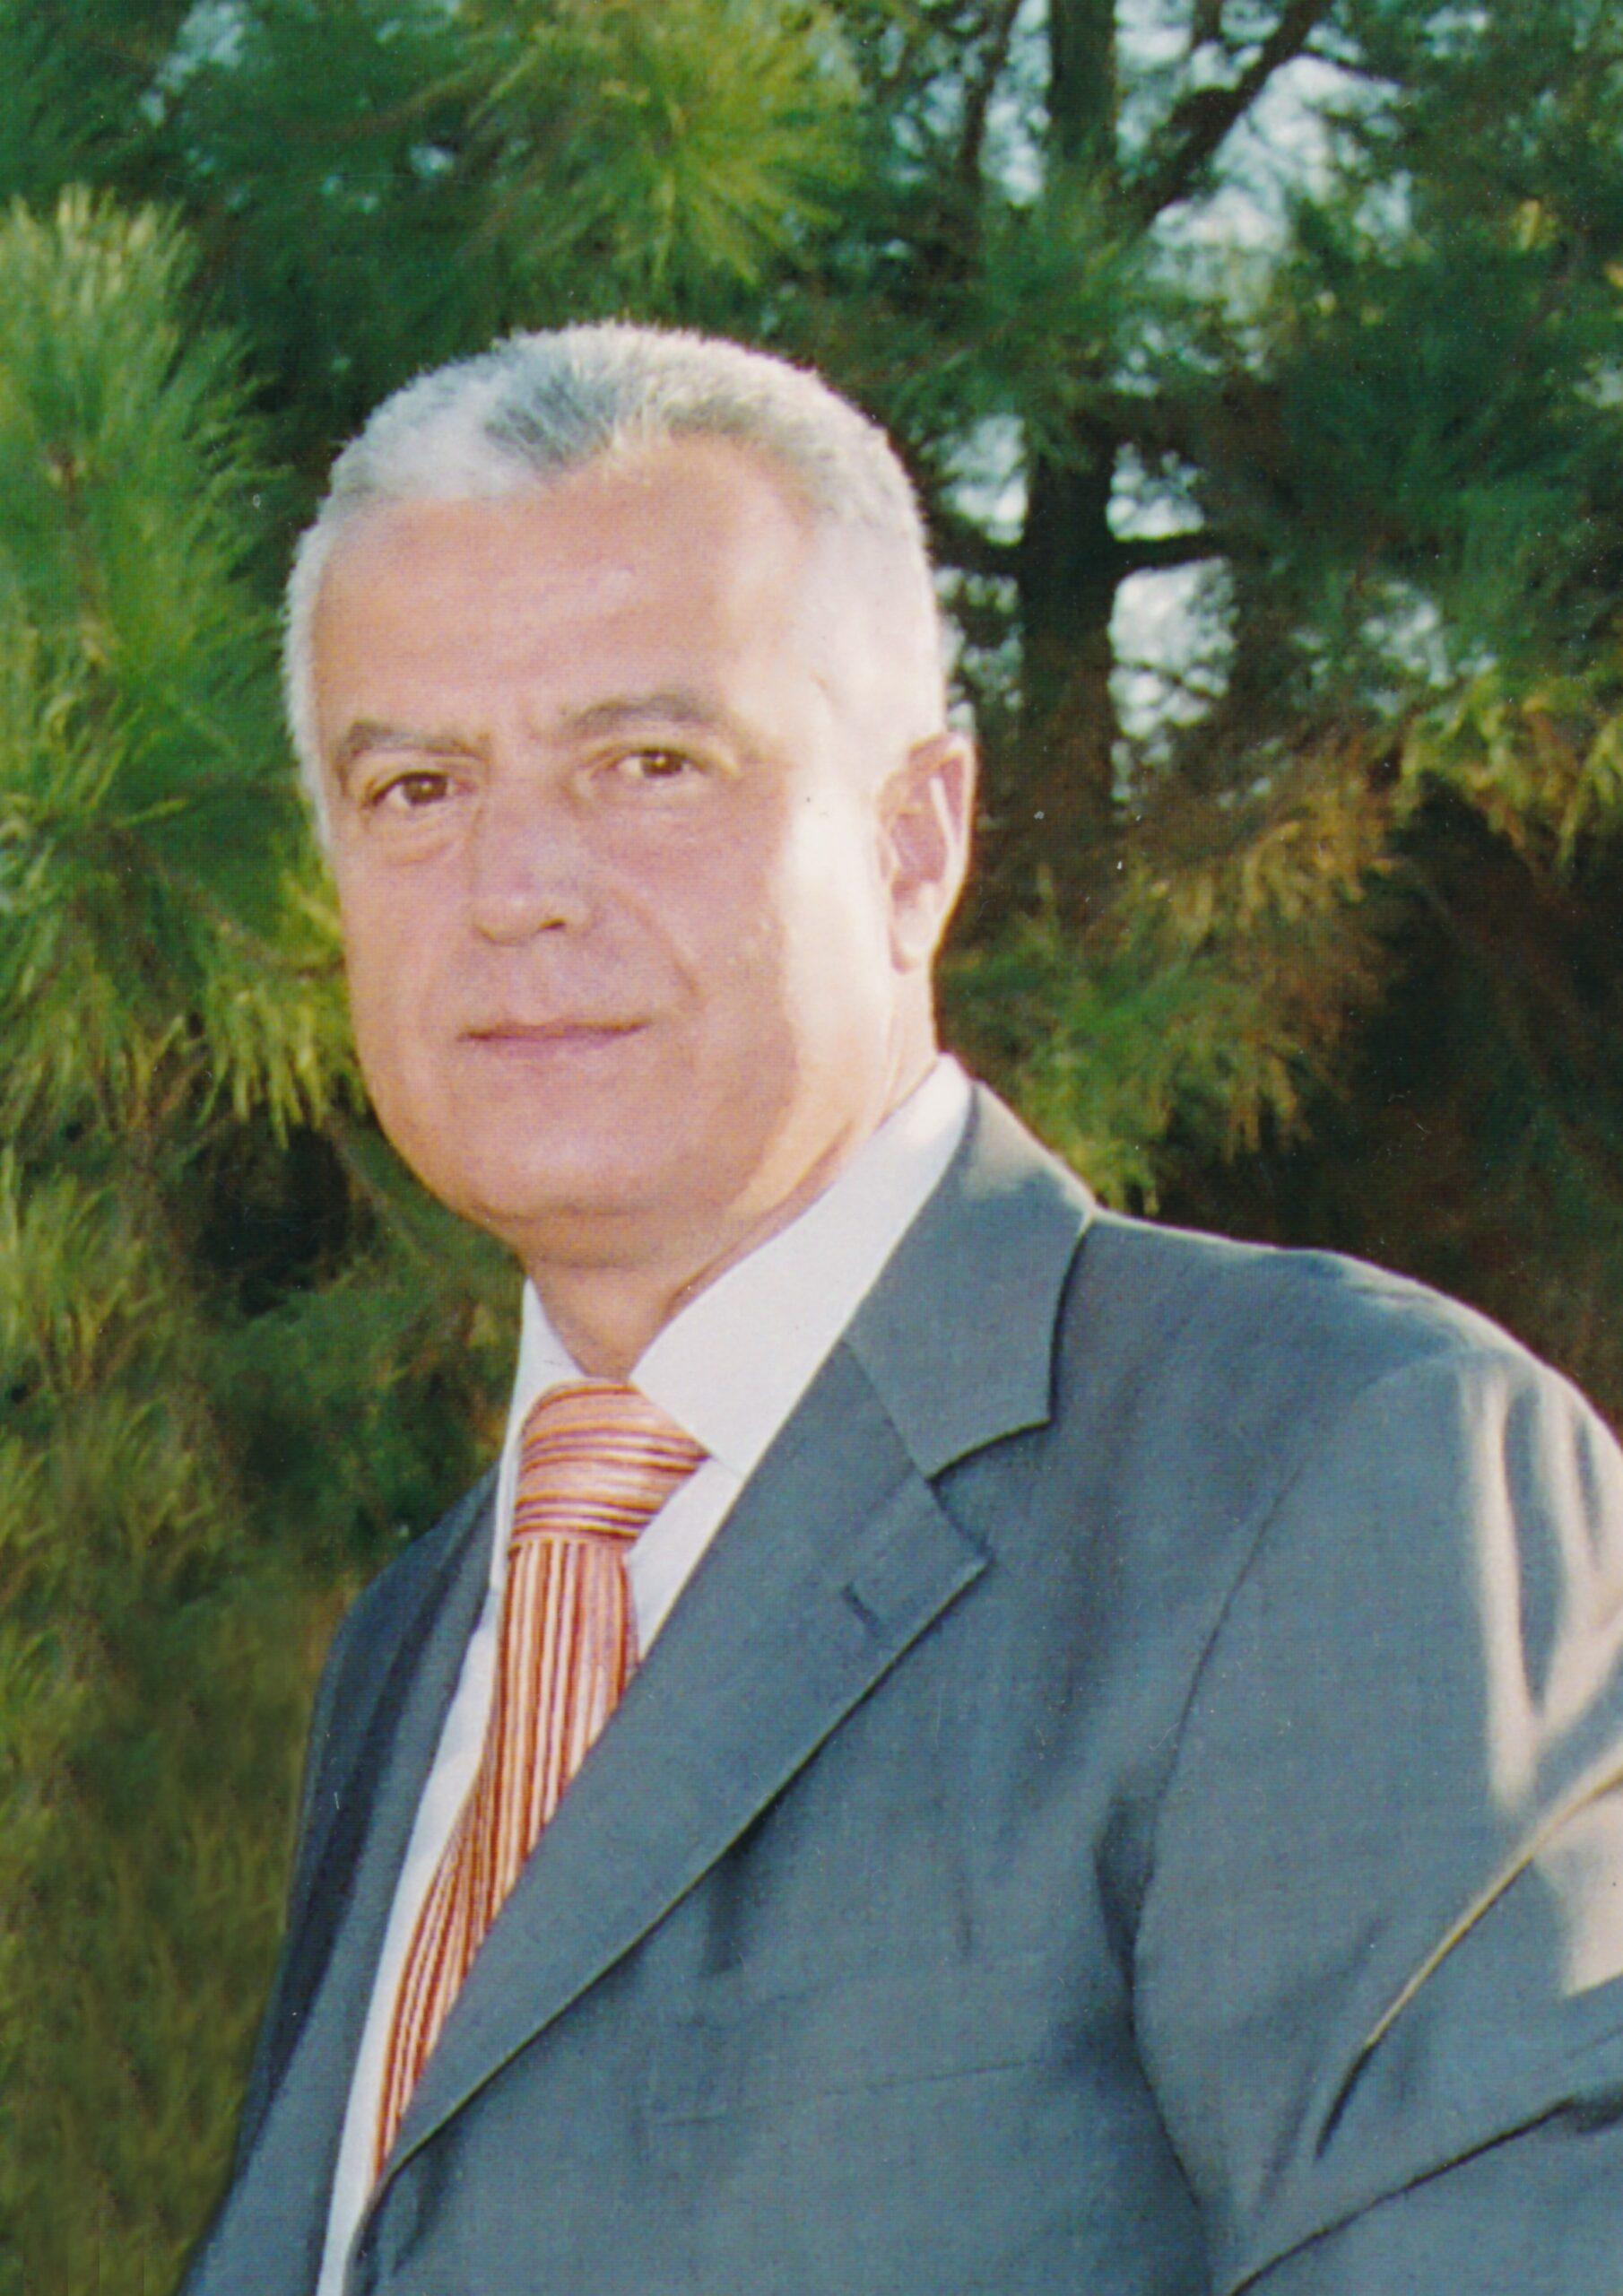 Panagiotis Ntentopoulos